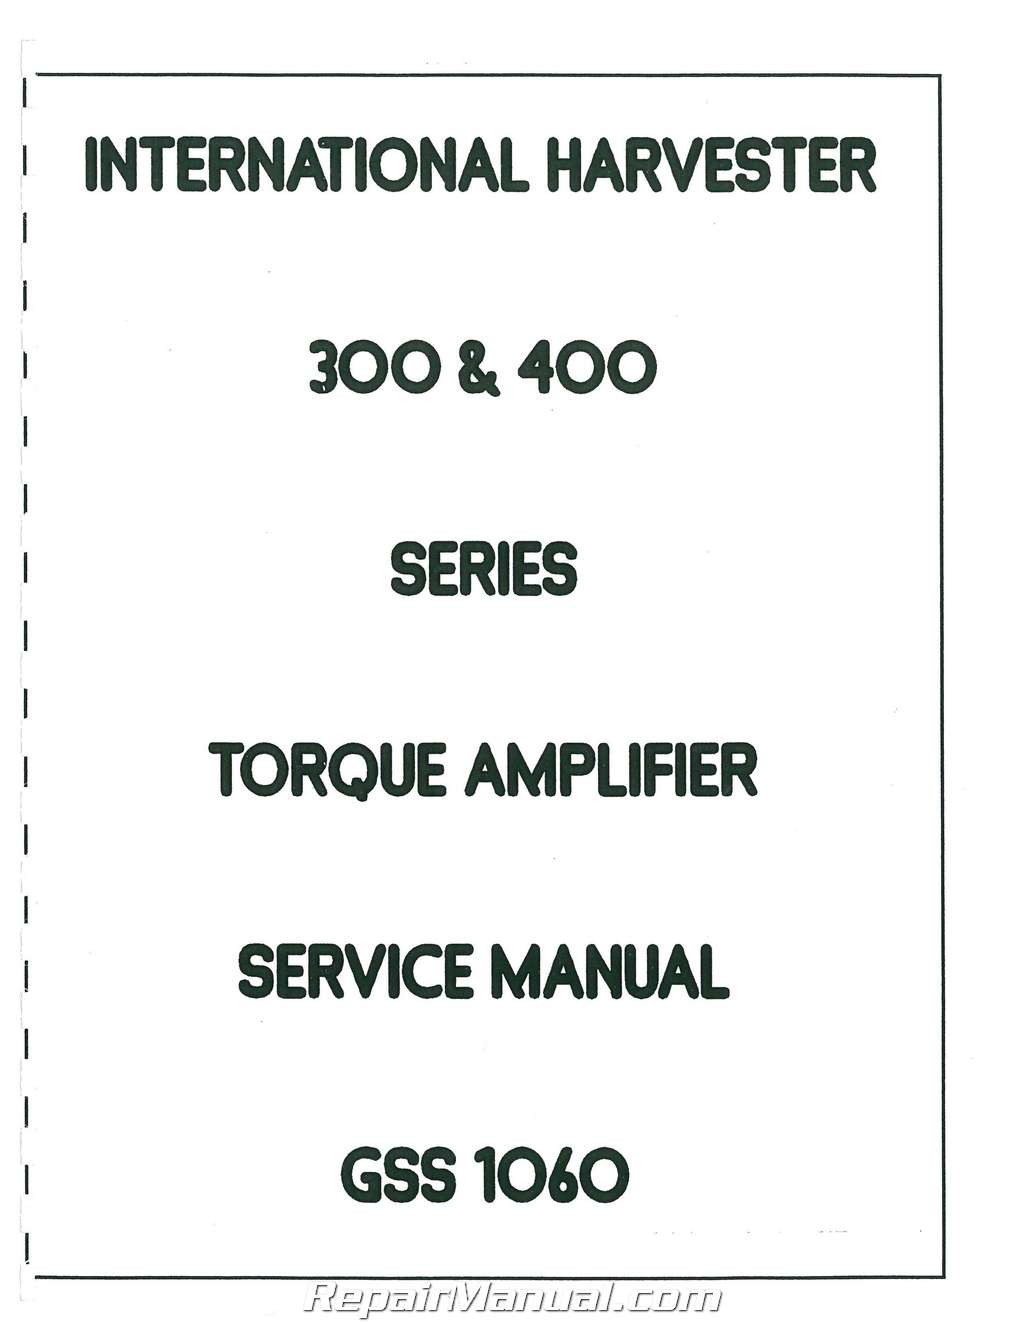 International Harvester 606 and 2606 Service Manual